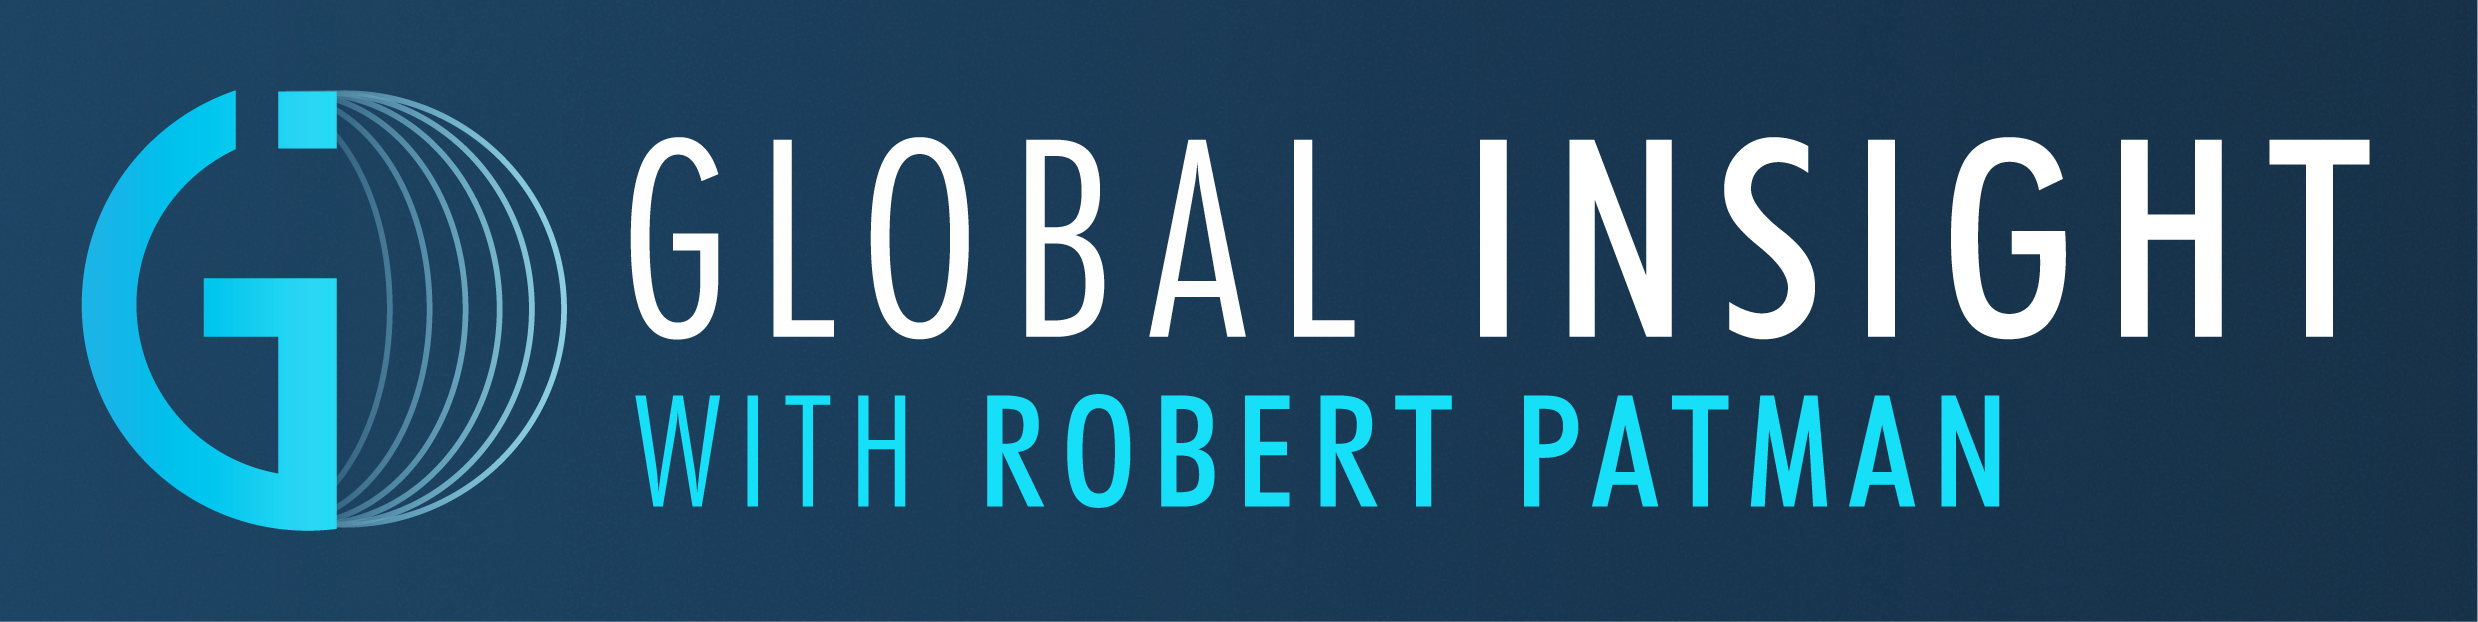 Global Insight with Robert Patman Header Image